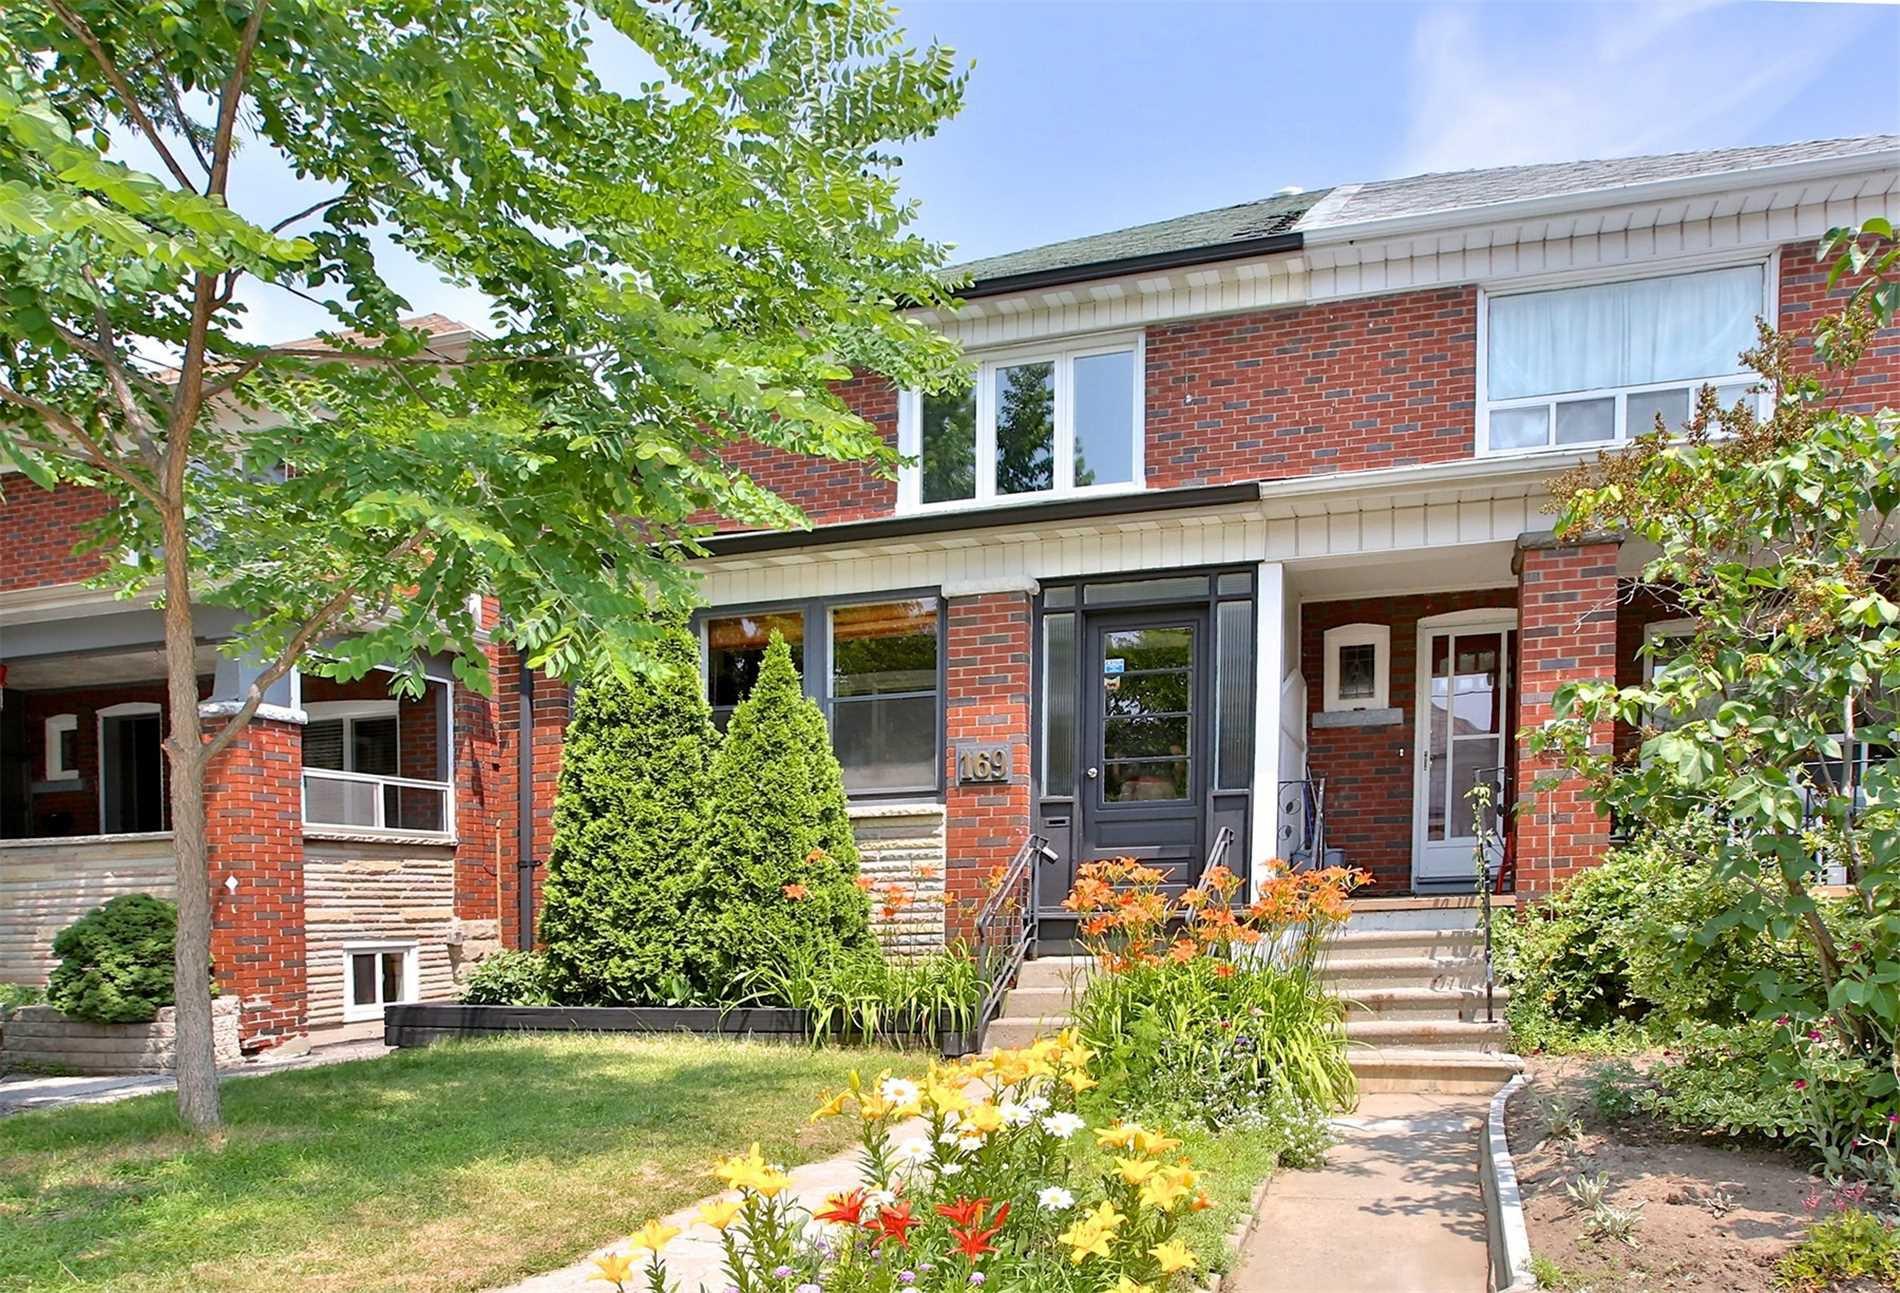 Main Photo: 169 Linsmore Crescent in Toronto: East York House (2-Storey) for sale (Toronto E03)  : MLS®# E4522457